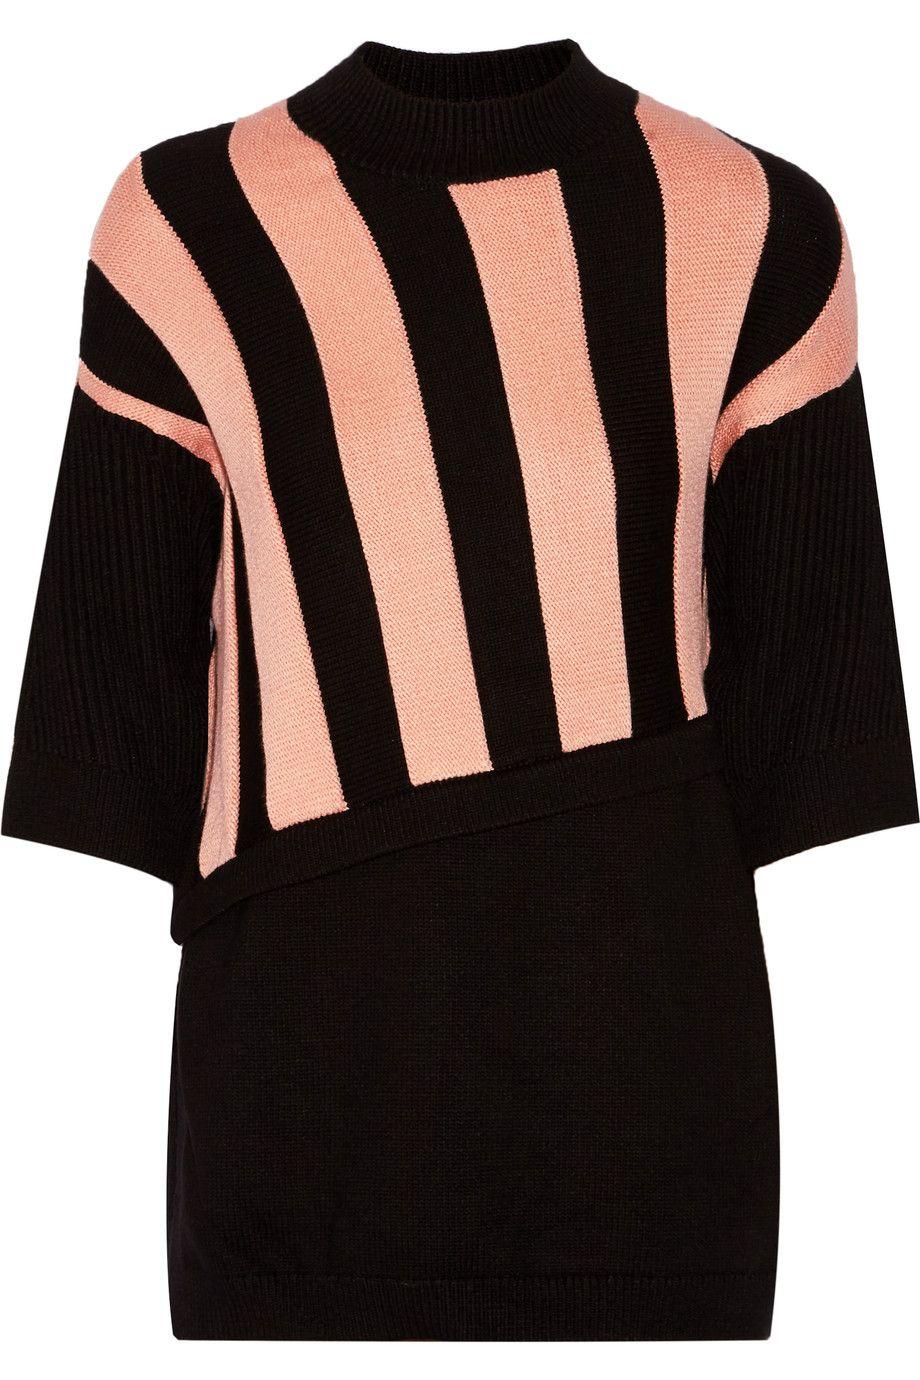 3.1 PHILLIP LIM Two-Tone Jacquard-Knit Sweater. #3.1philliplim #cloth #sweater